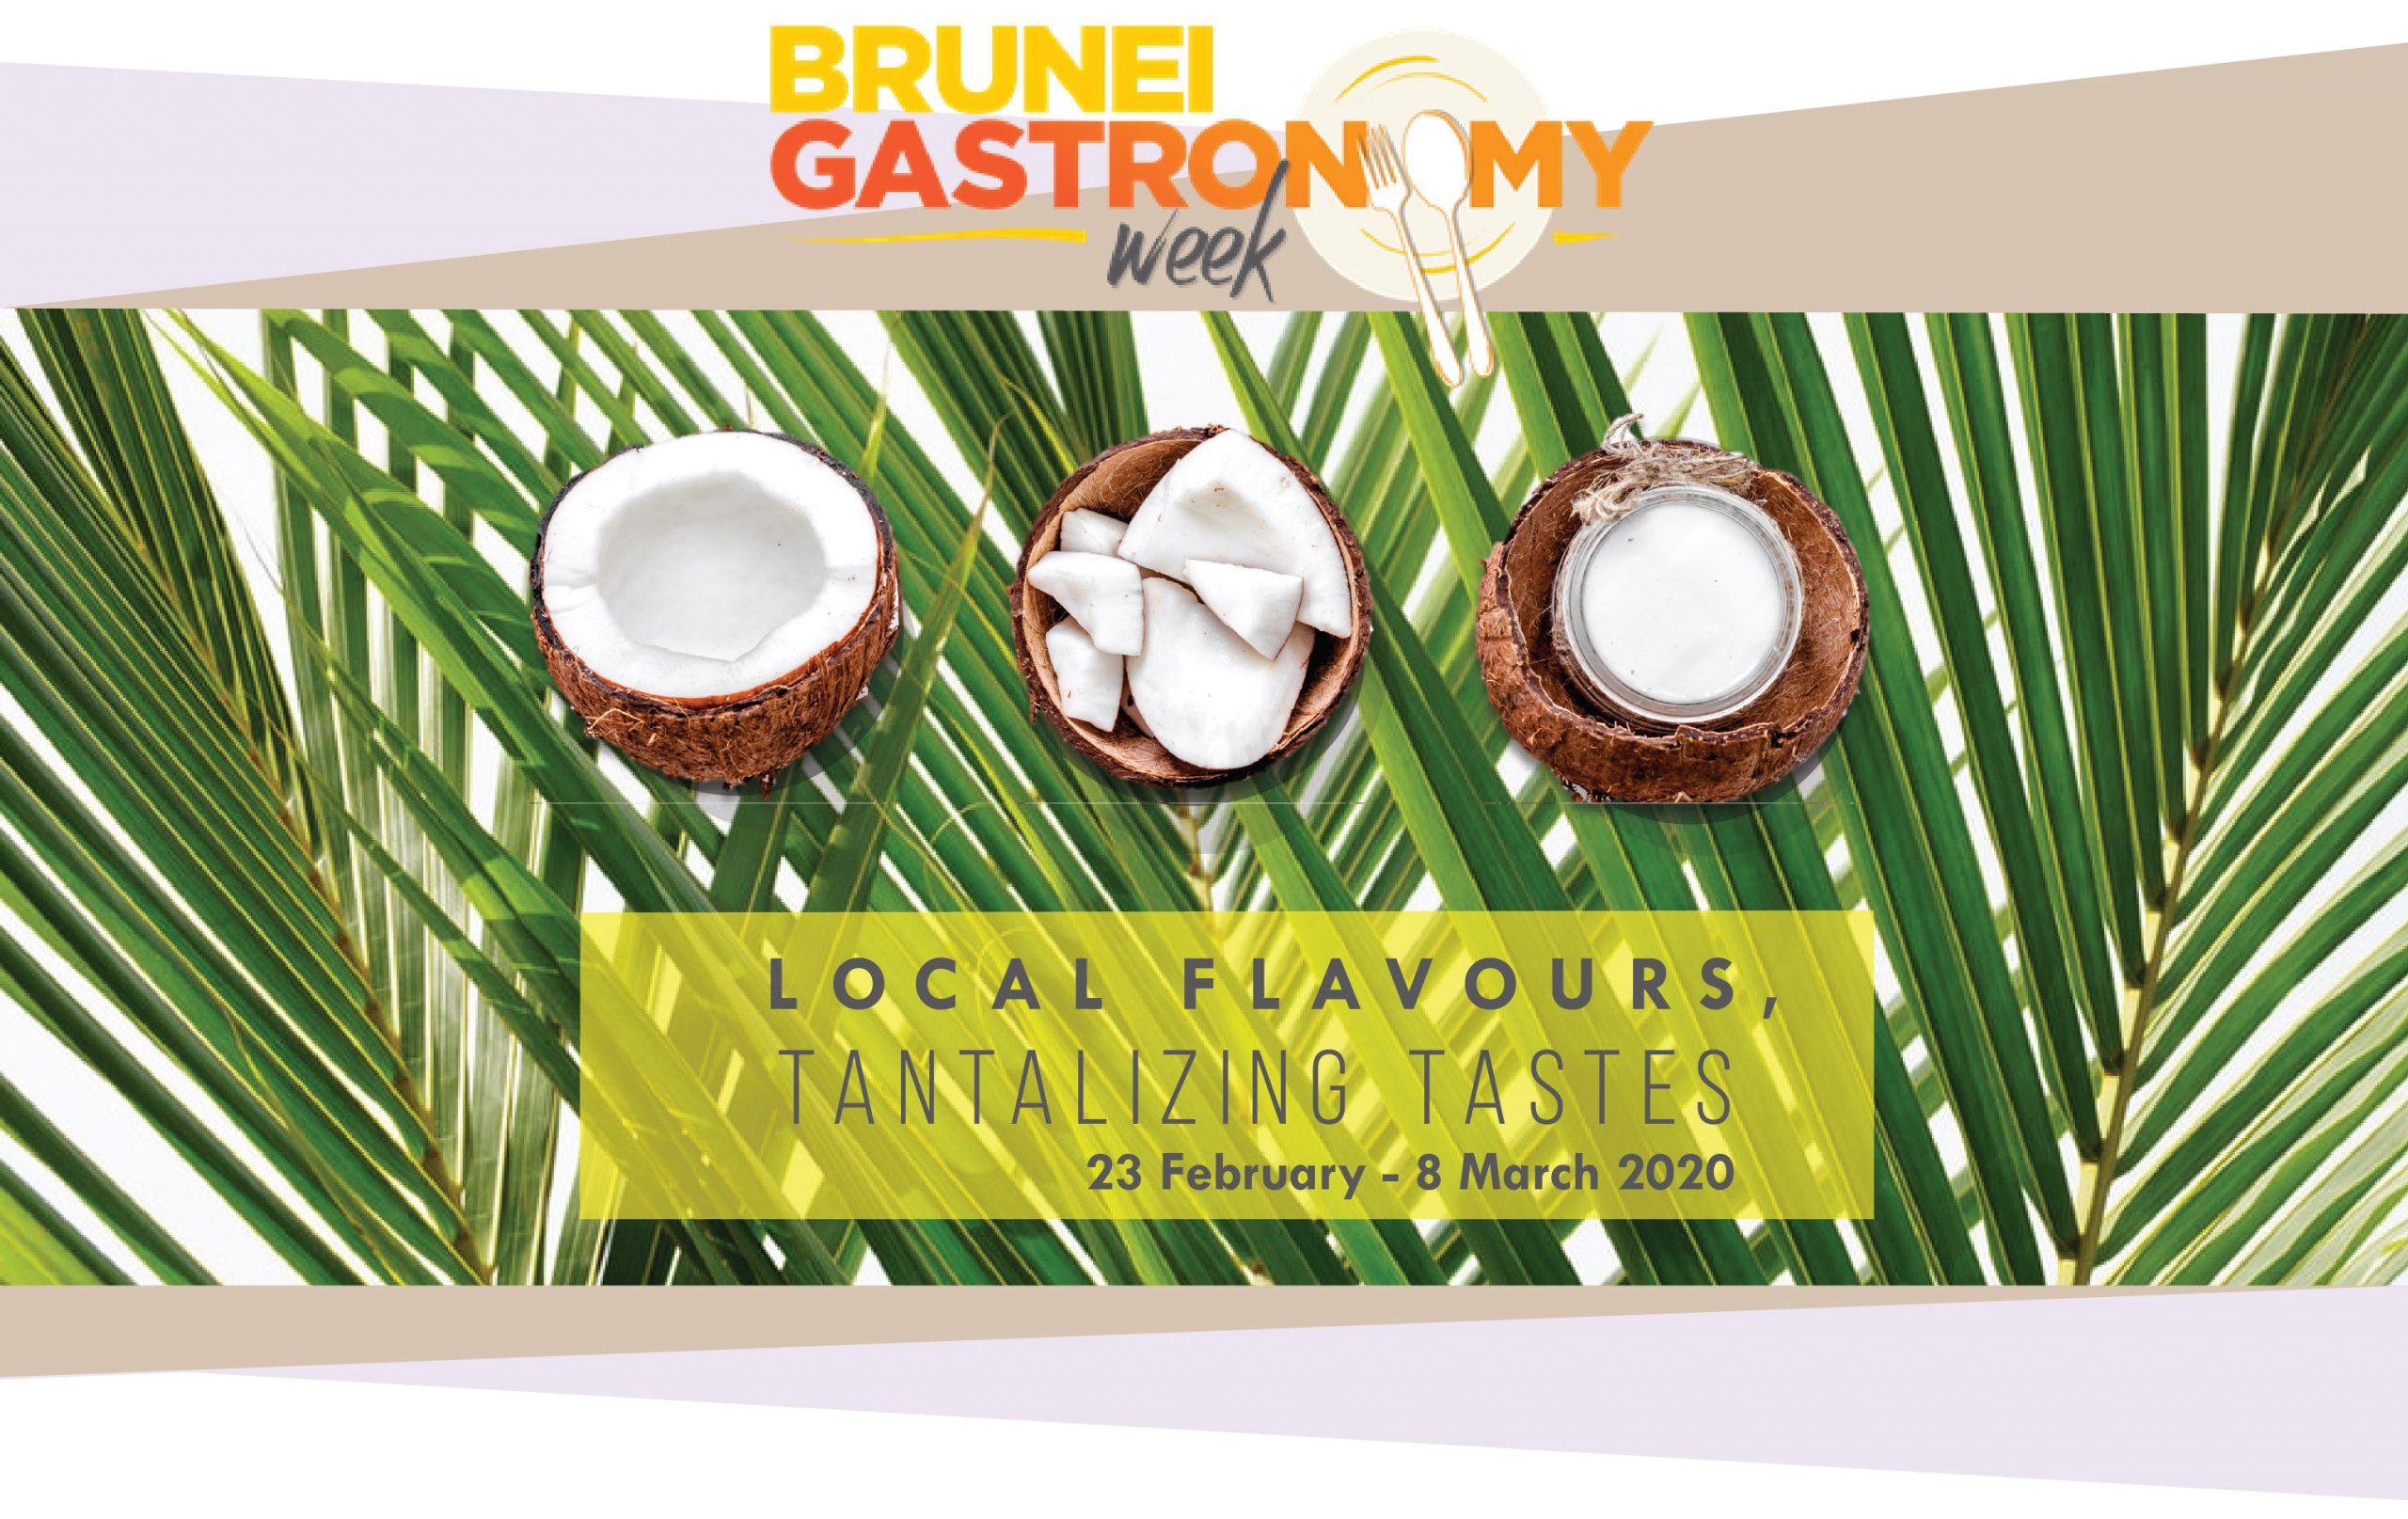 Brunei-Gastronomy-week-scaled